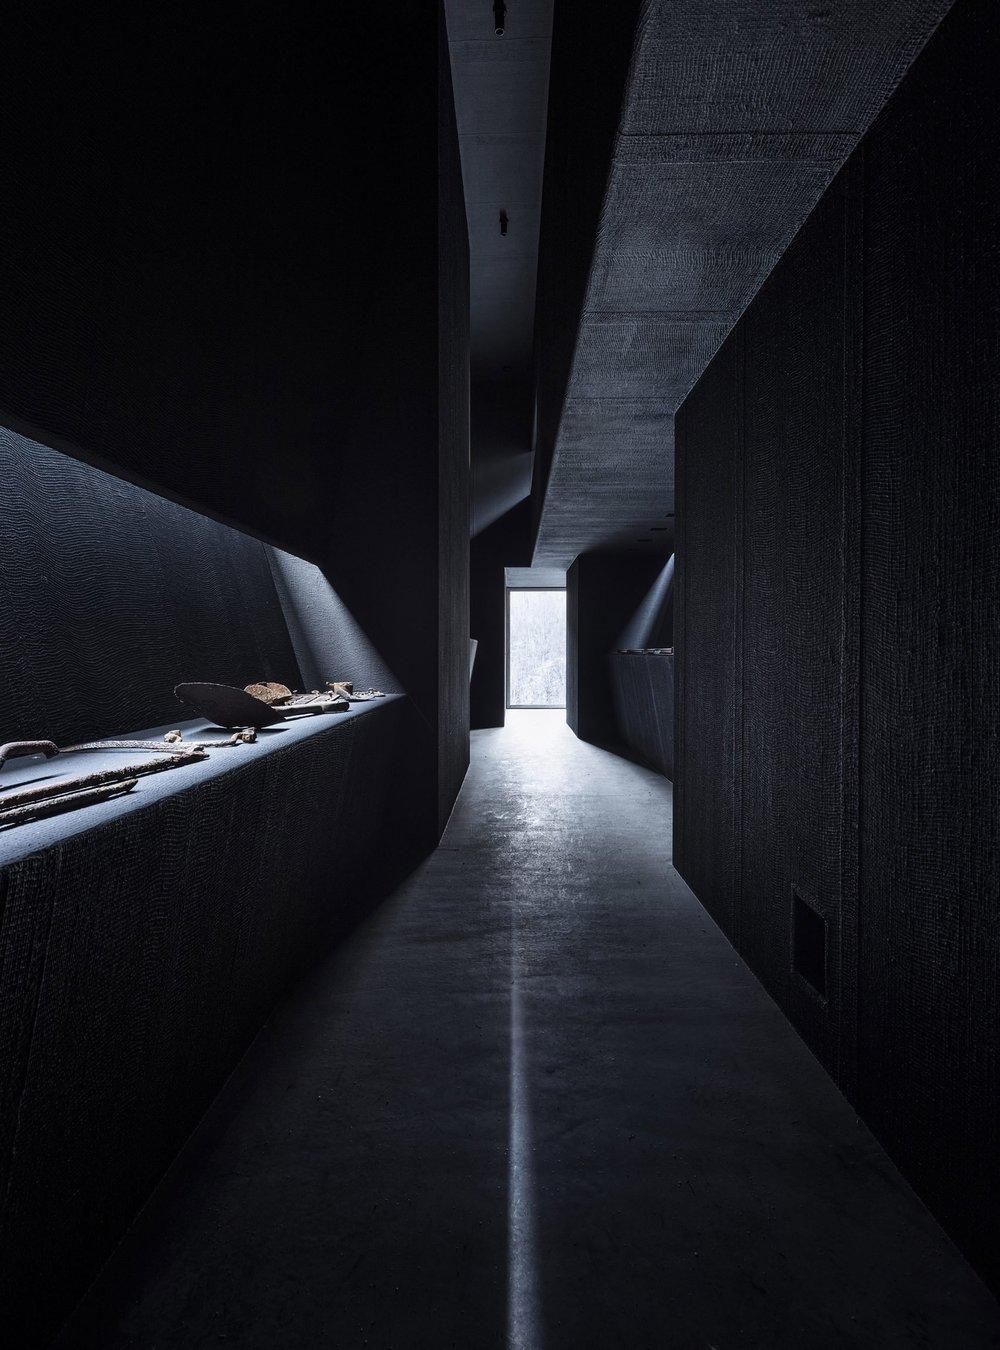 aldo-amoretti-mine-zinc-museum-architecture-photography-_dezeen_2364_col_18-1704x2301.jpg